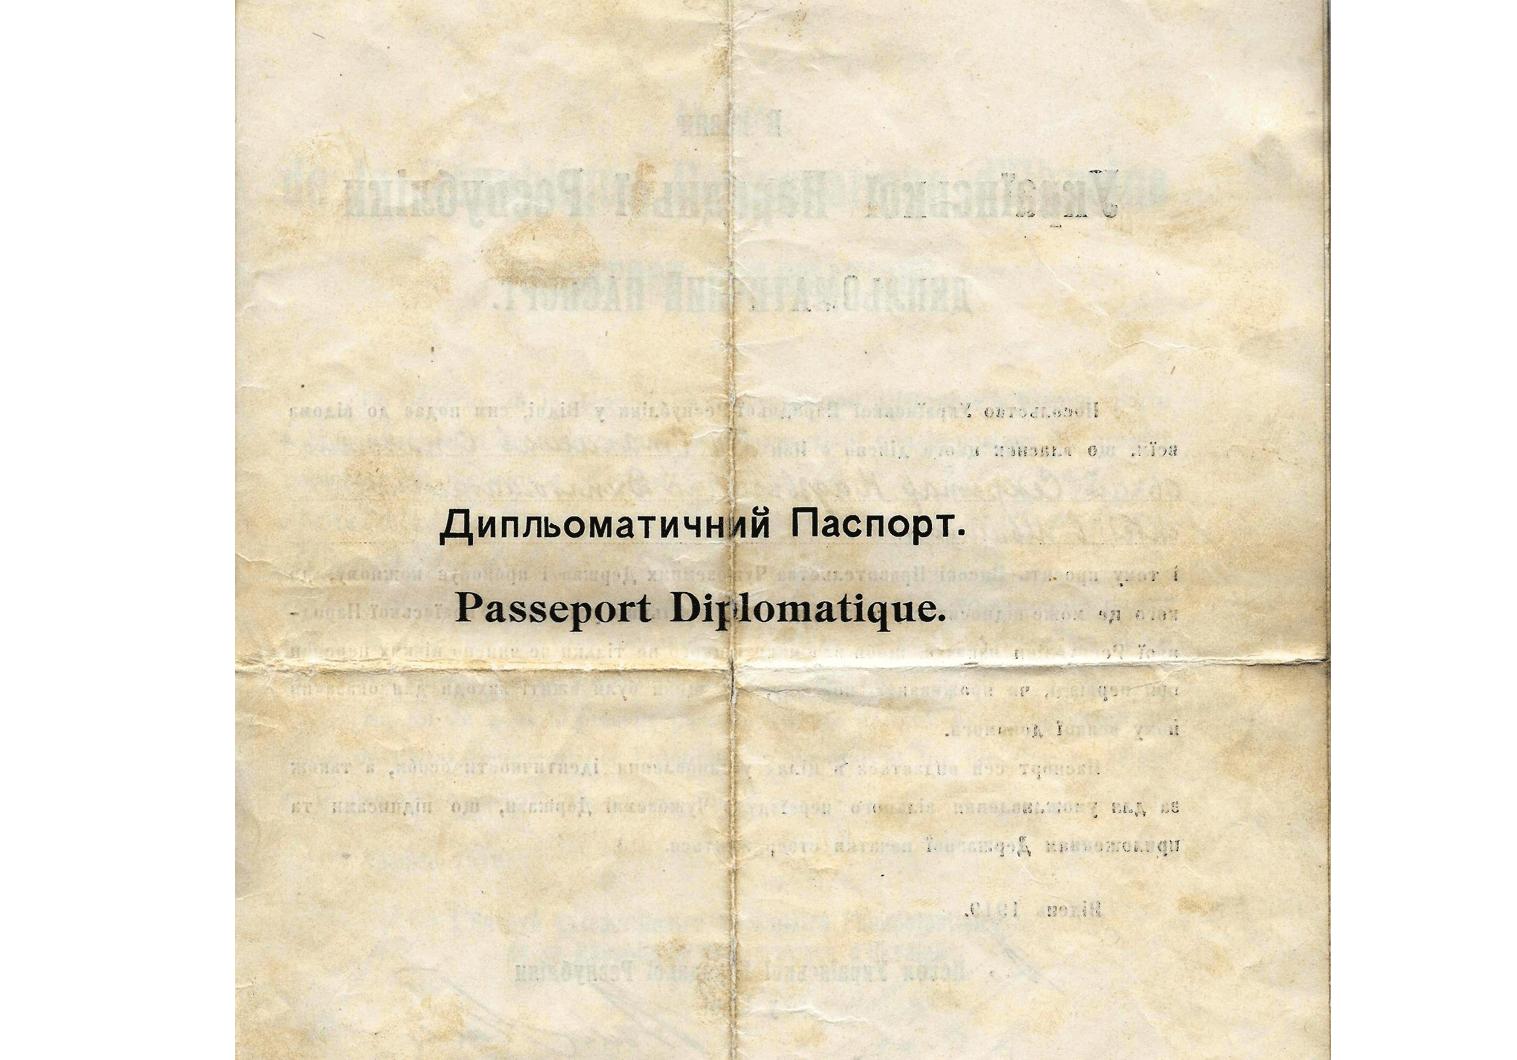 Ukrainian passport 1919